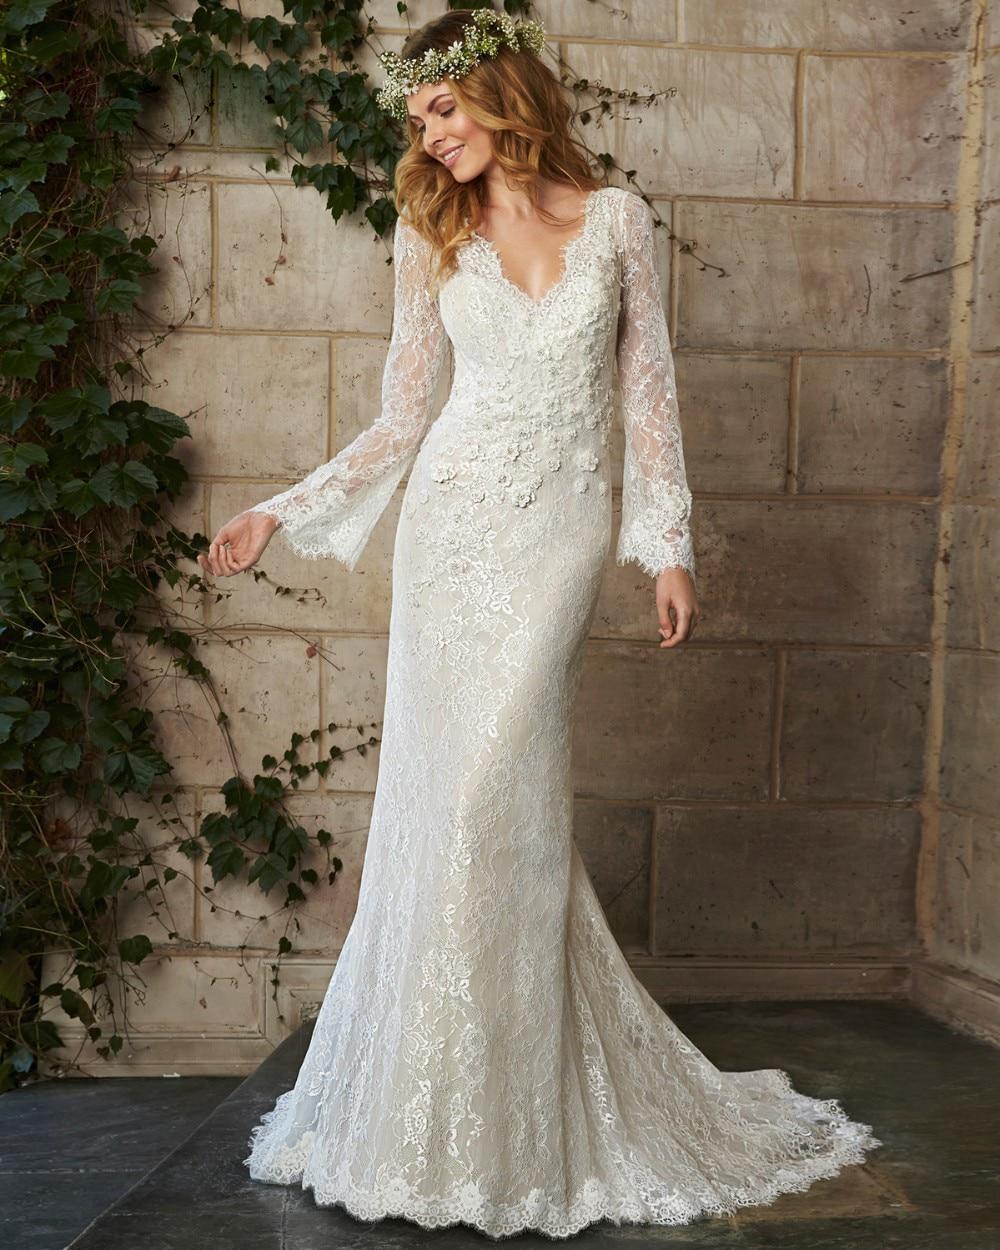 Romantic boho wedding dress 2016 v neck long sleeve for Romantic bohemian wedding dresses